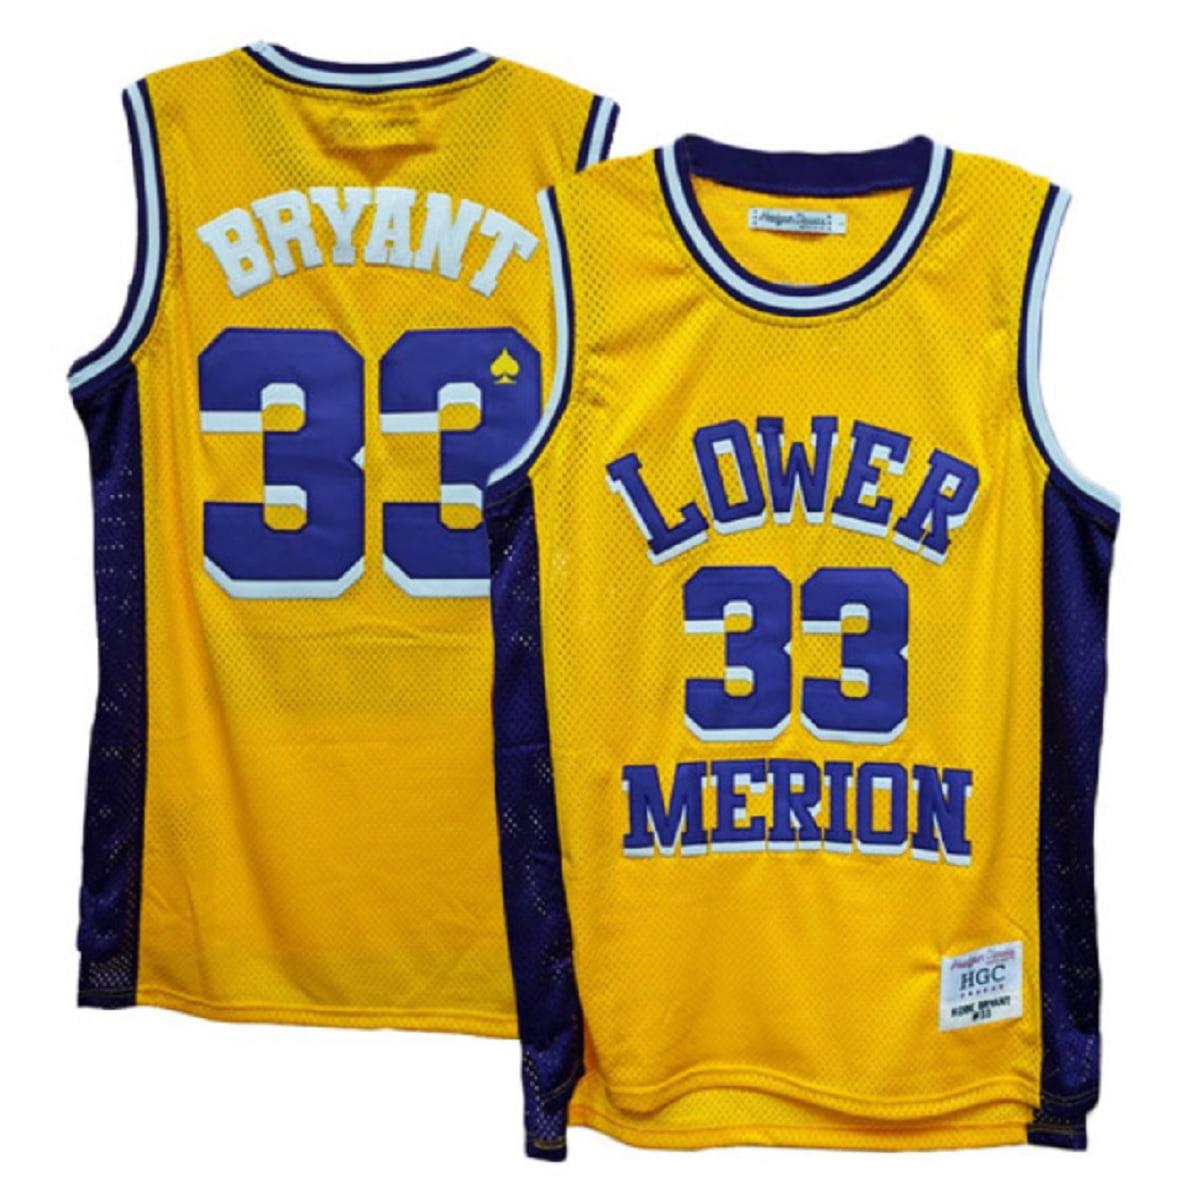 Headgear - Lower Merion Aces Kobe Bryant Gold/Purple High School Jersey (3X) - Walmart.com